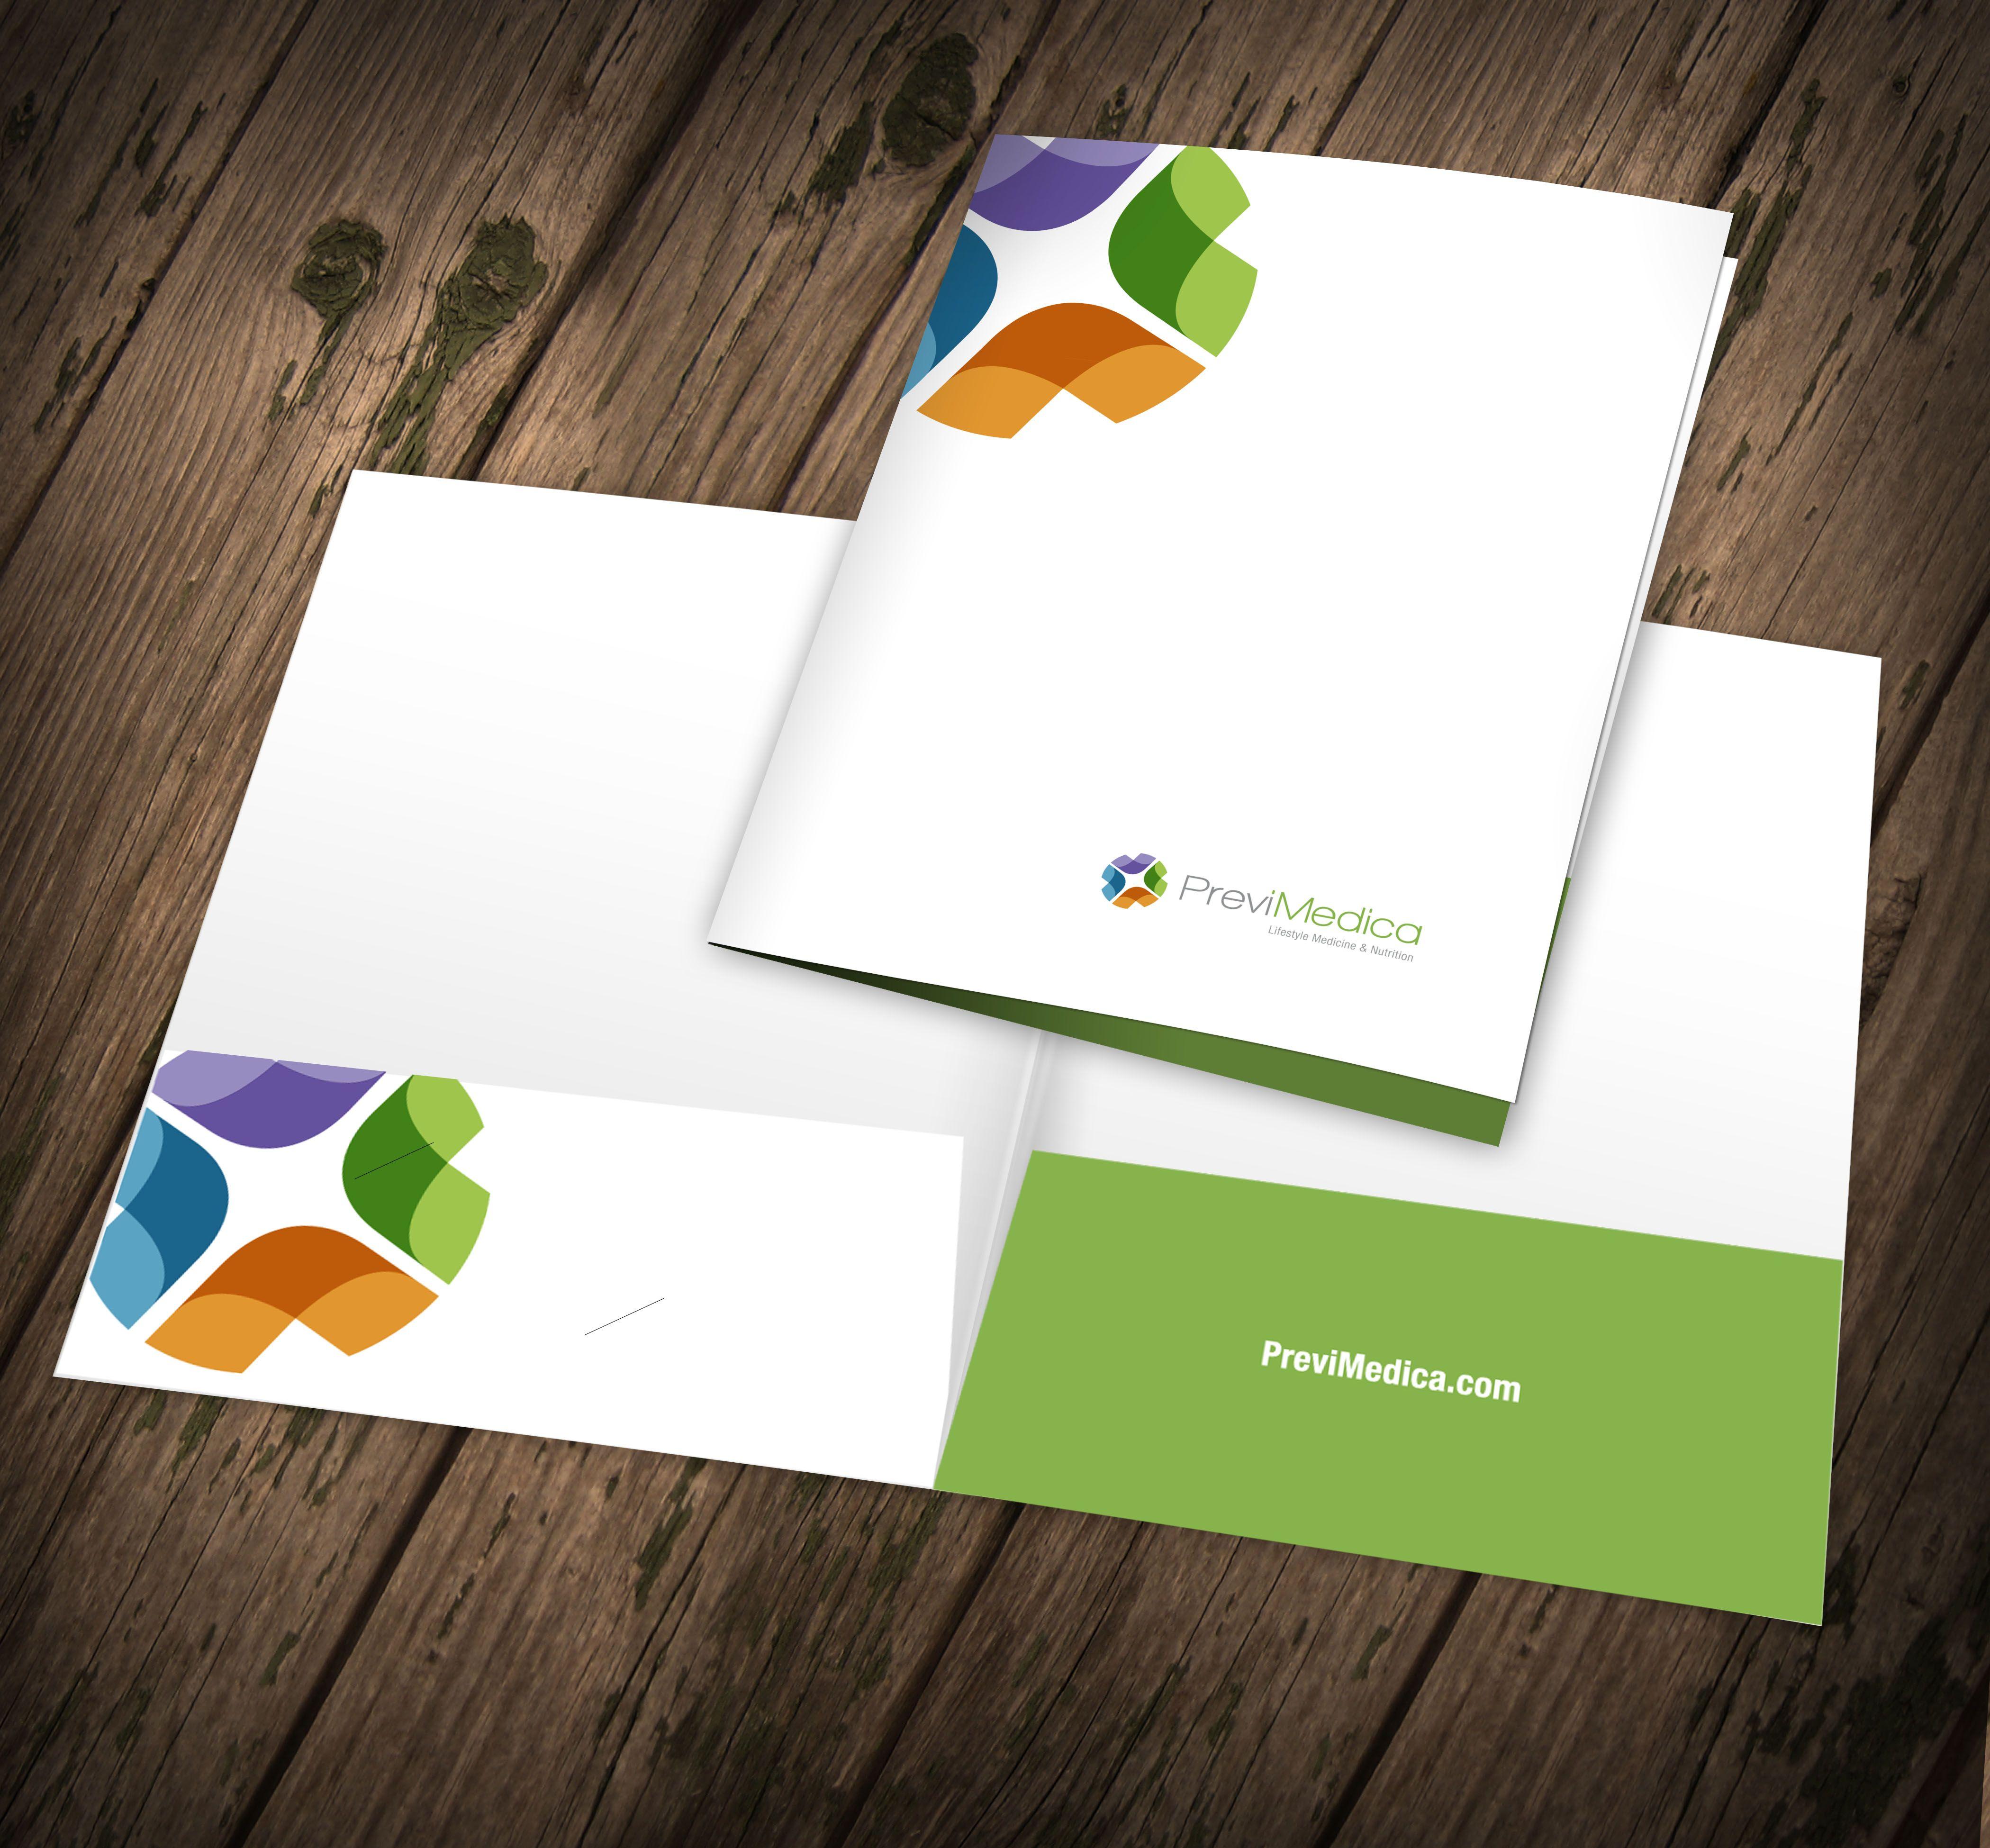 Folder Design for Client PreviMedica | Collateral Design | Pinterest ...